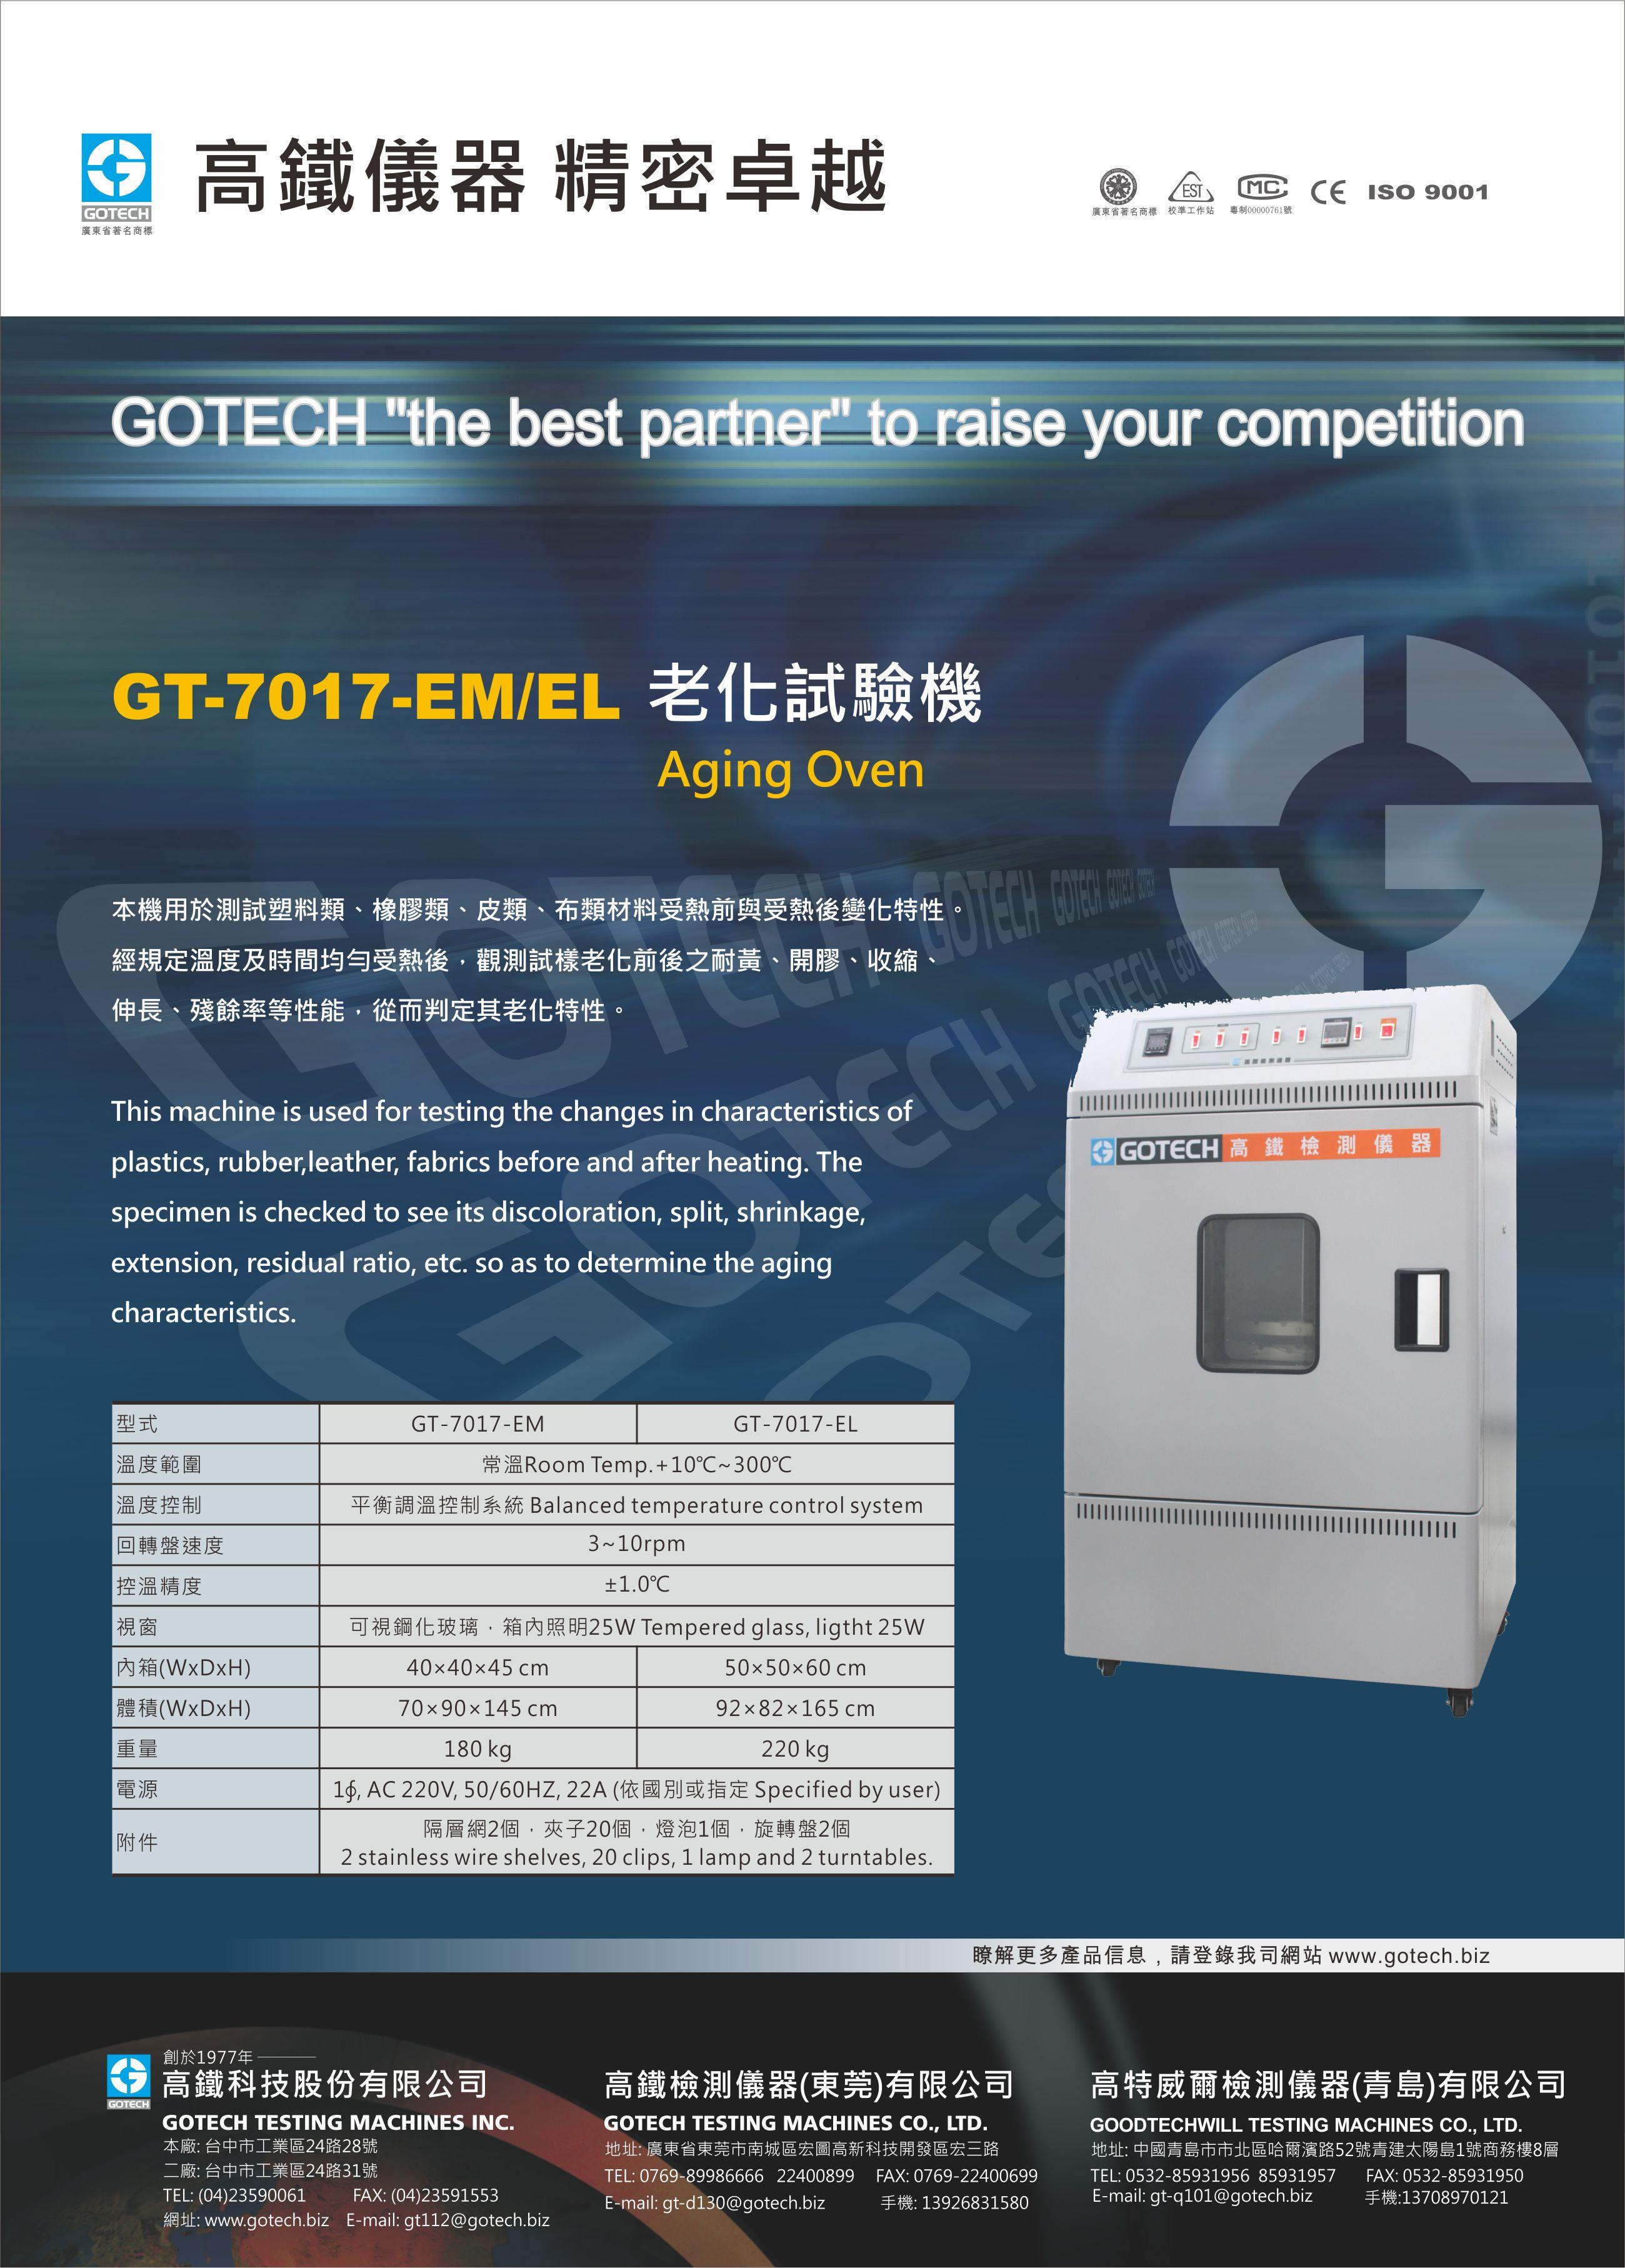 GT-7017-EM/EL Aging Oven - GOTECH TESTING MACHINES INC